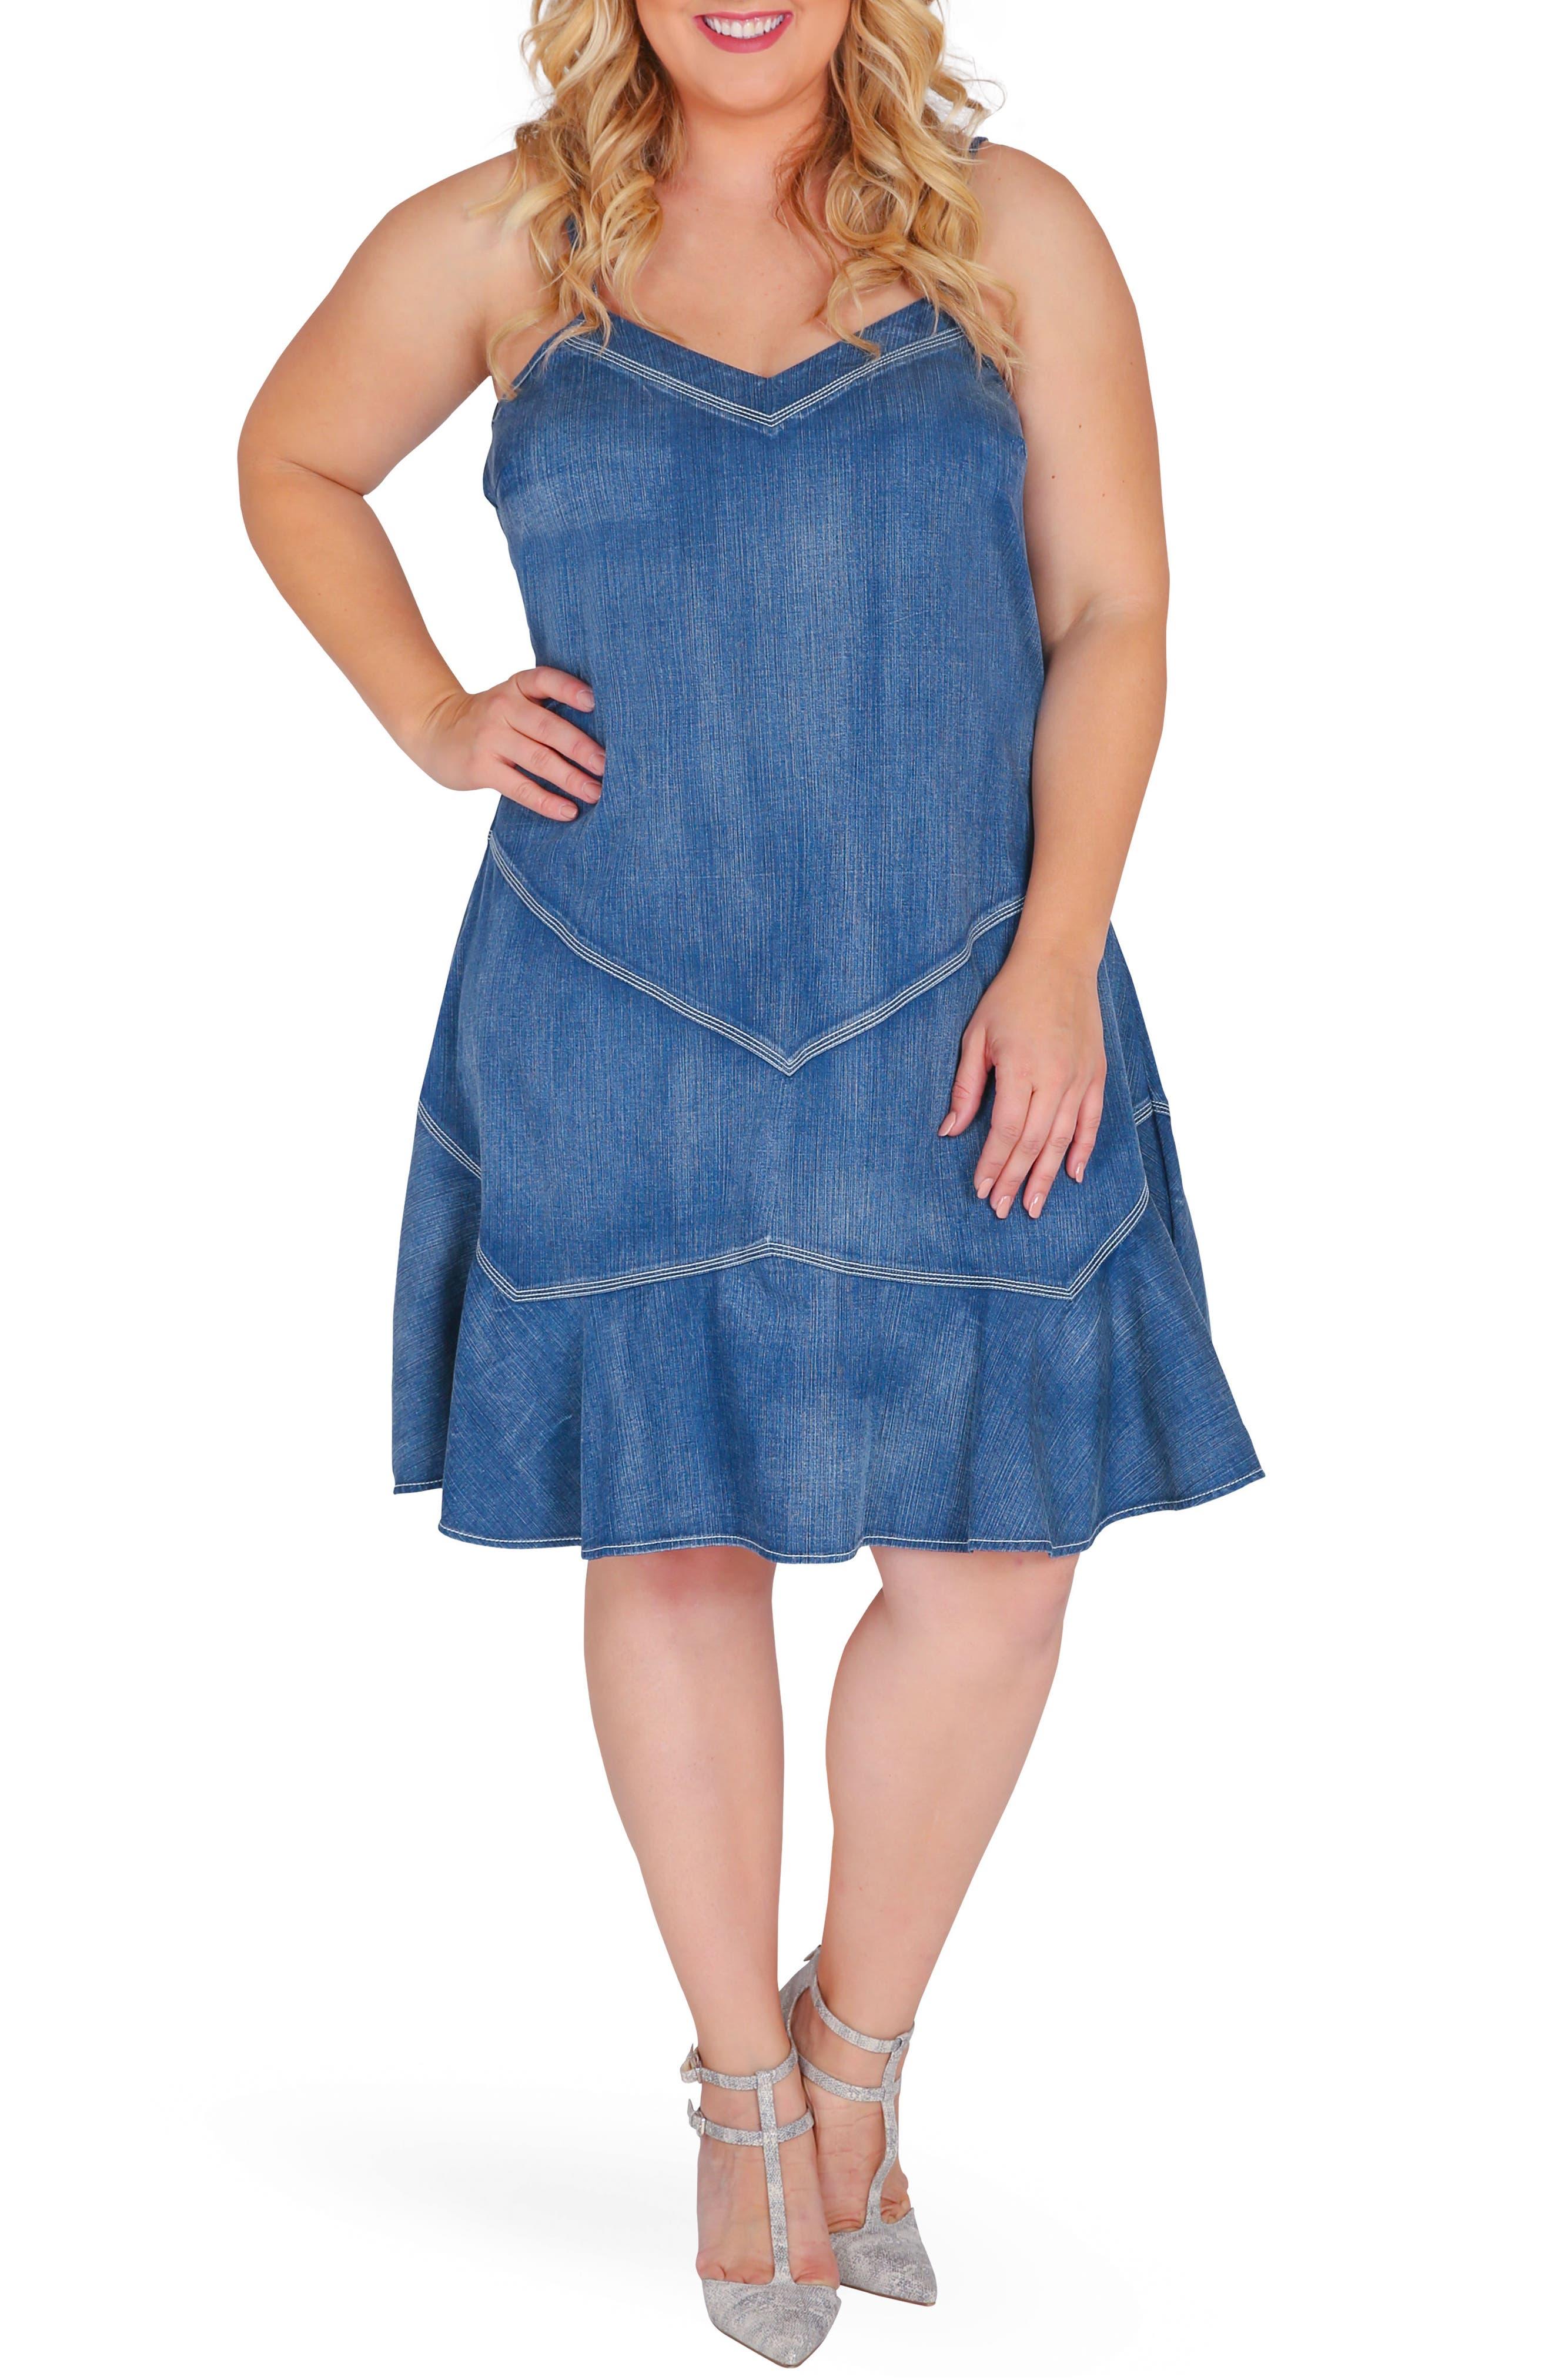 Rosie Denim Tank Dress,                             Main thumbnail 1, color,                             Enchanted Blue